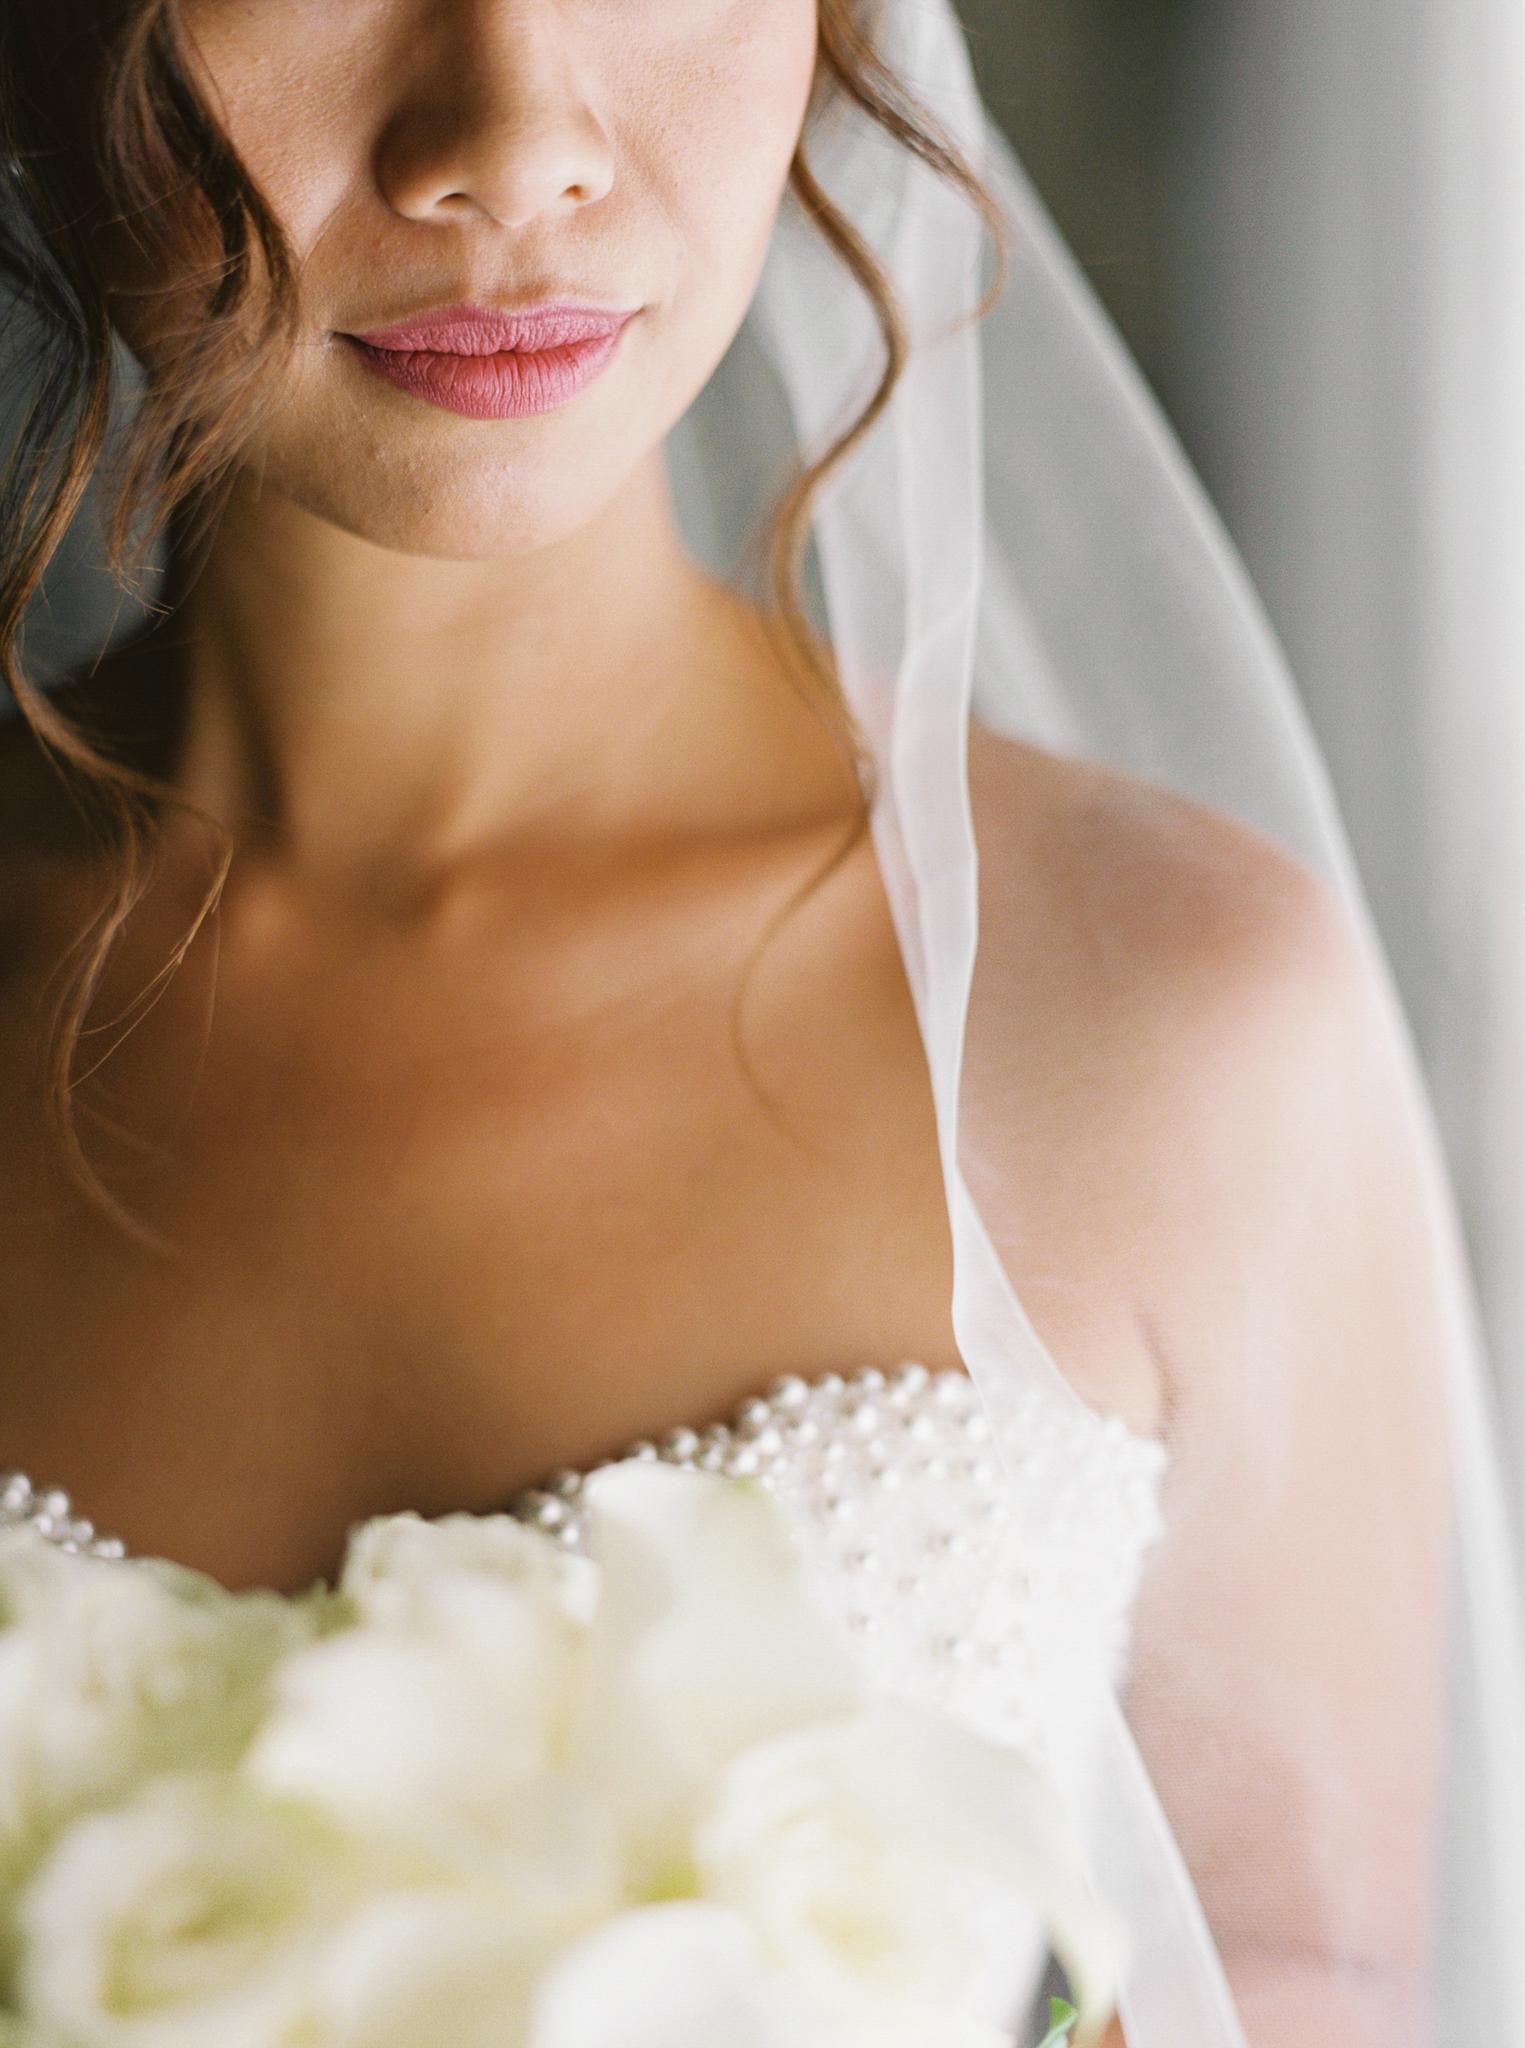 015OutliveCreative_Travel_Photographer_Videographer_Lewis&Clark_Oregon_Elegant_BlackTie_Destination_Wedding.jpg